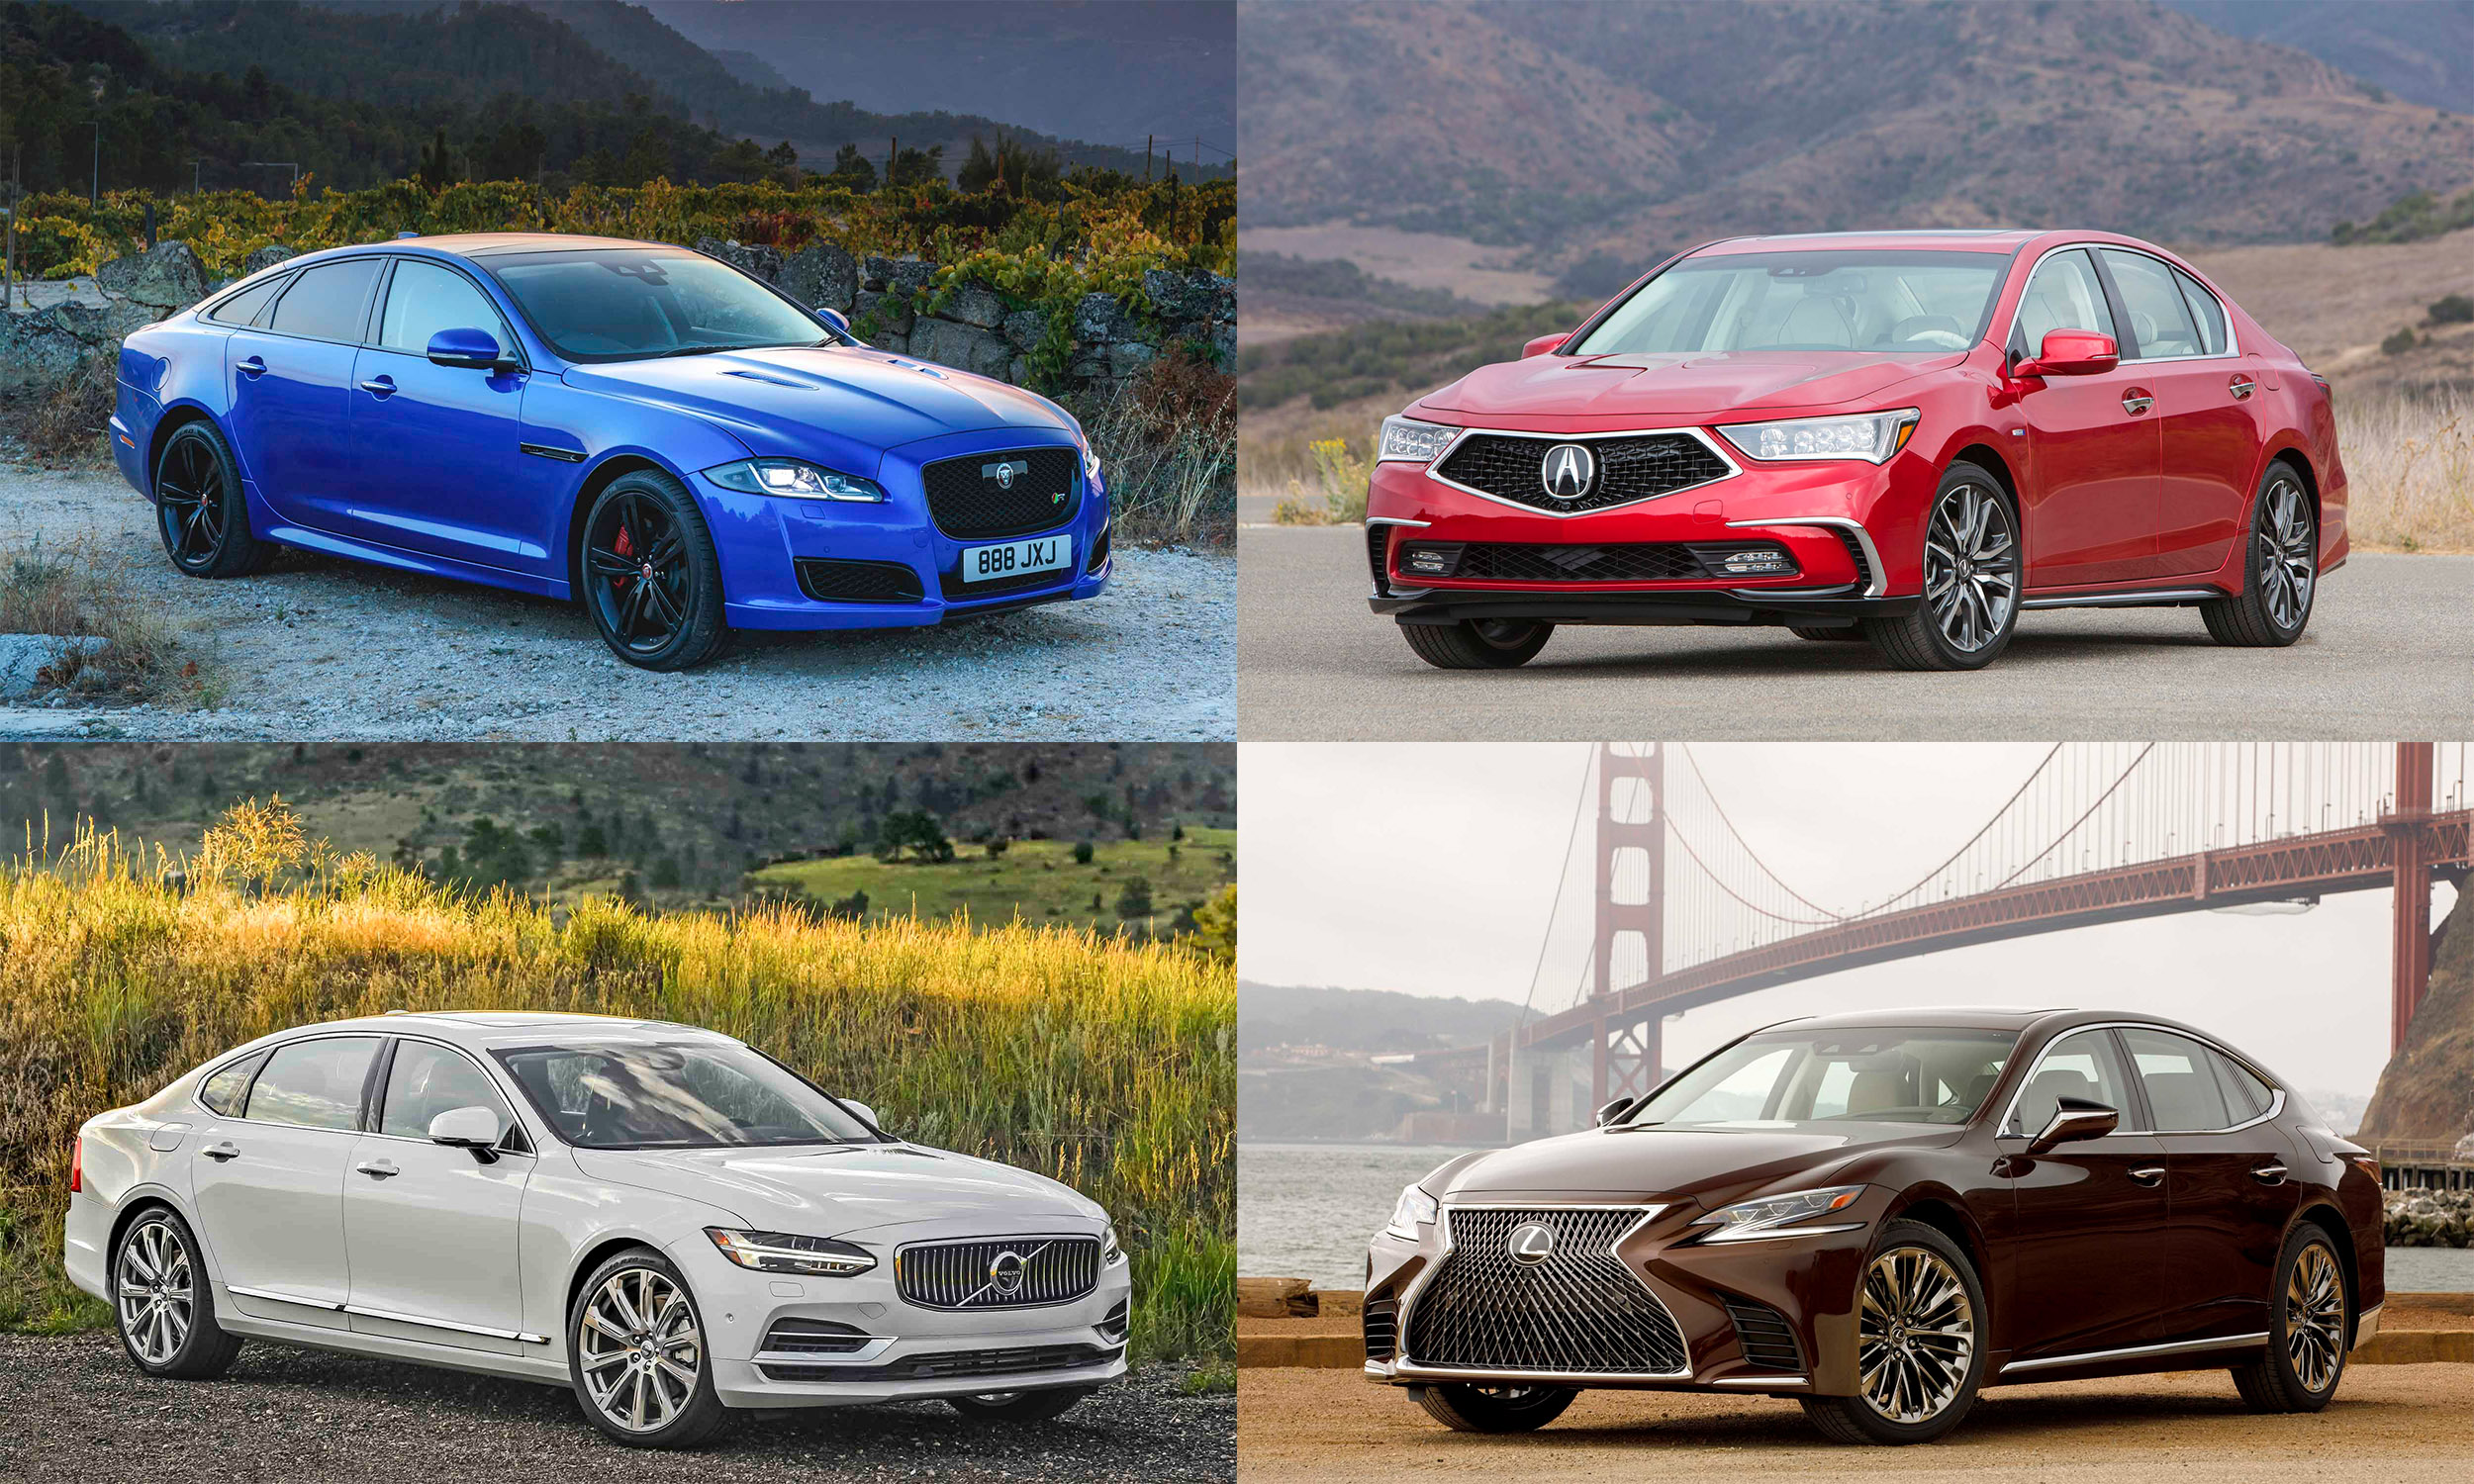 © Jaguar Land Rover North America; American Honda Motor Company; Toyota Motor Sales; Volvo Cars of North America